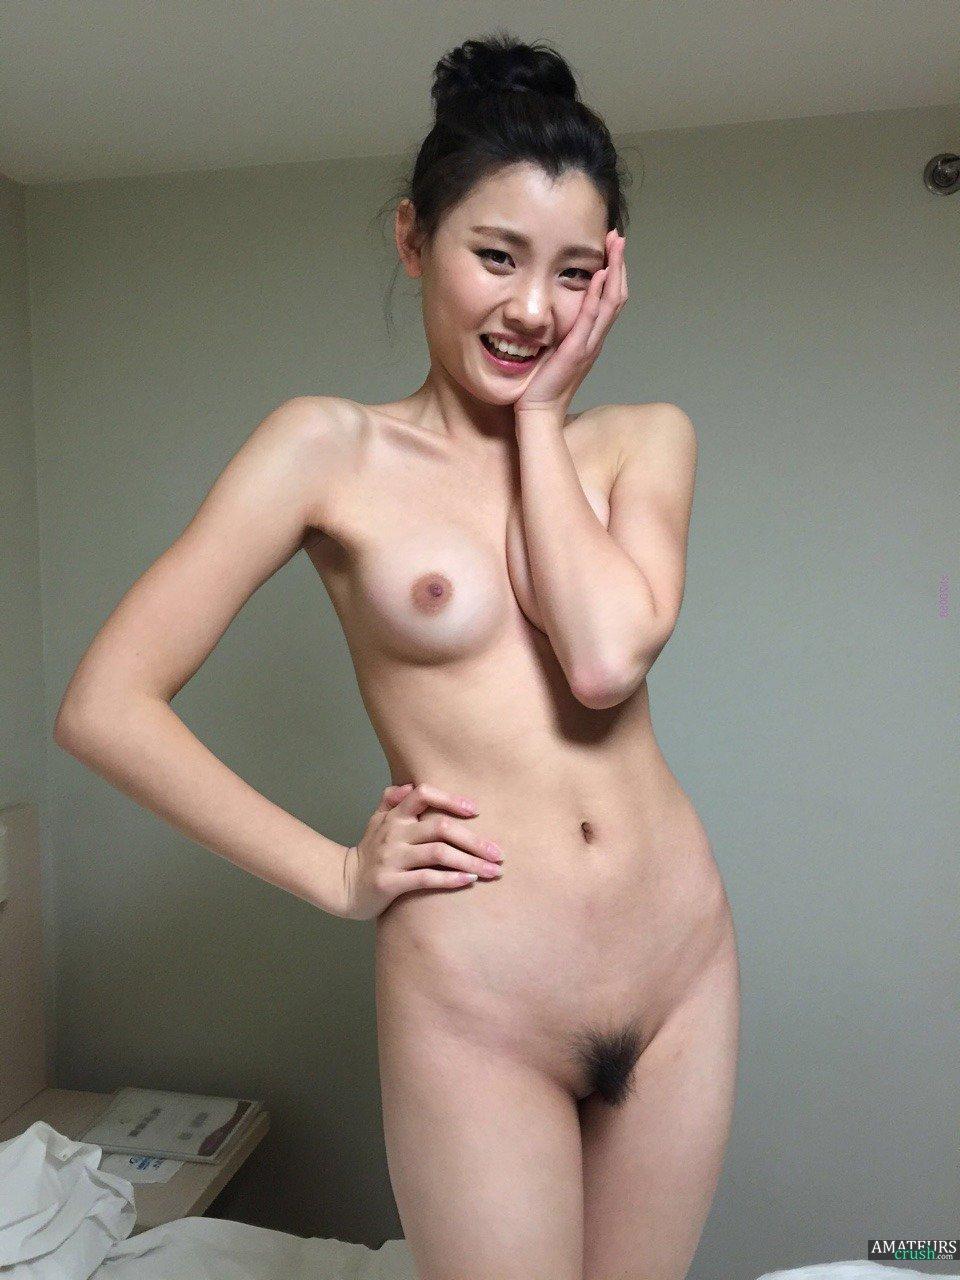 Guts sucking hot babes boobies nude